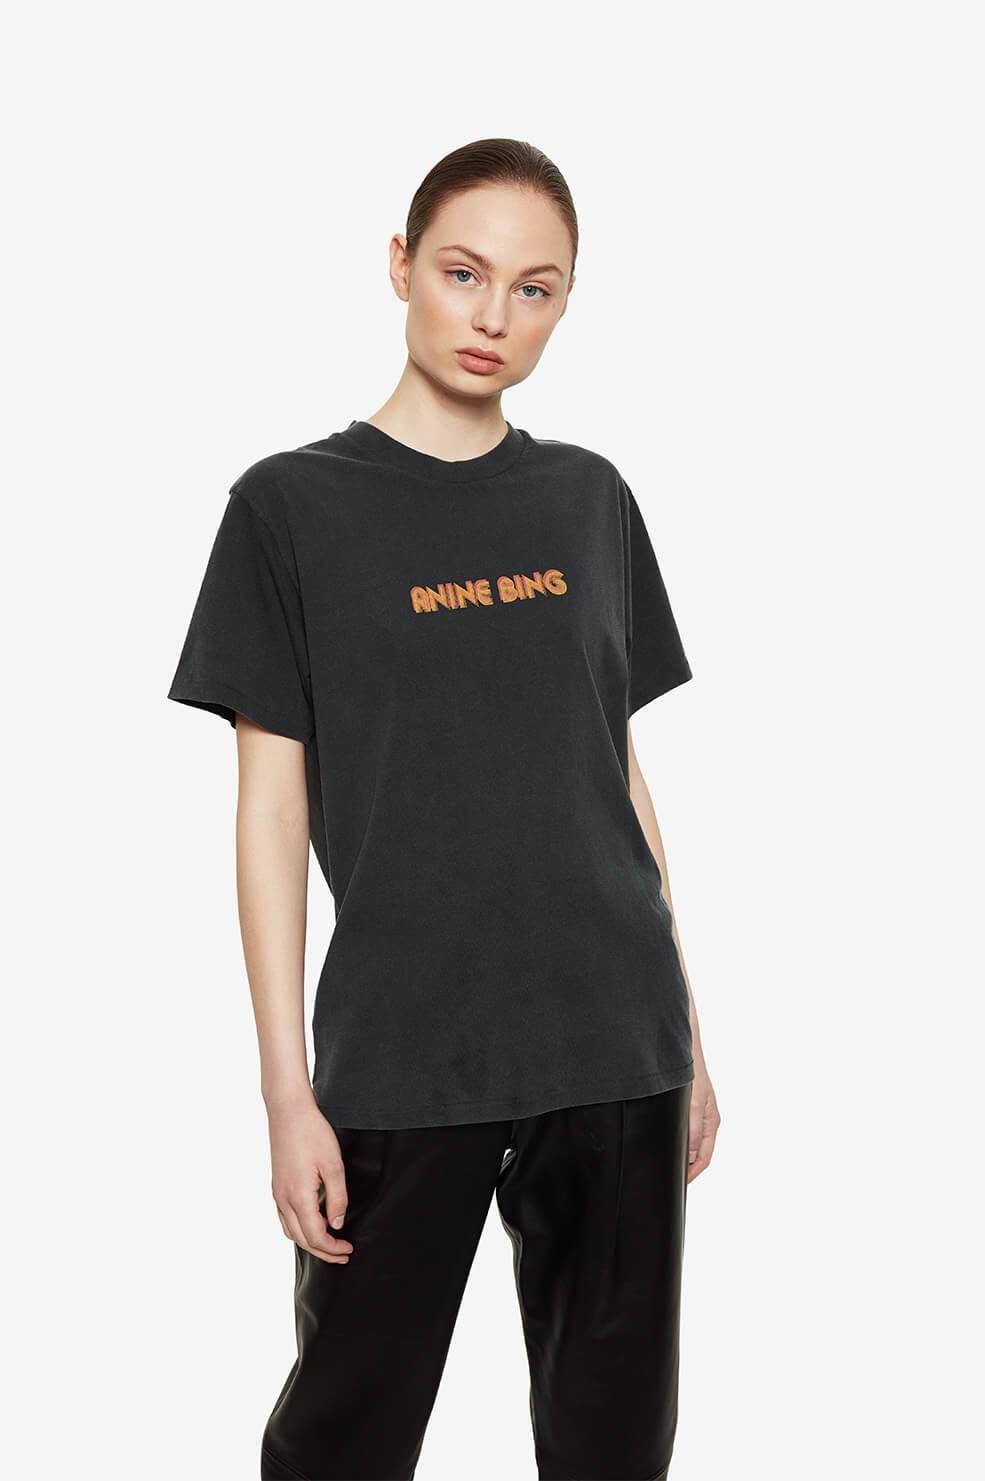 ANINE BING t shirt lili retro-5